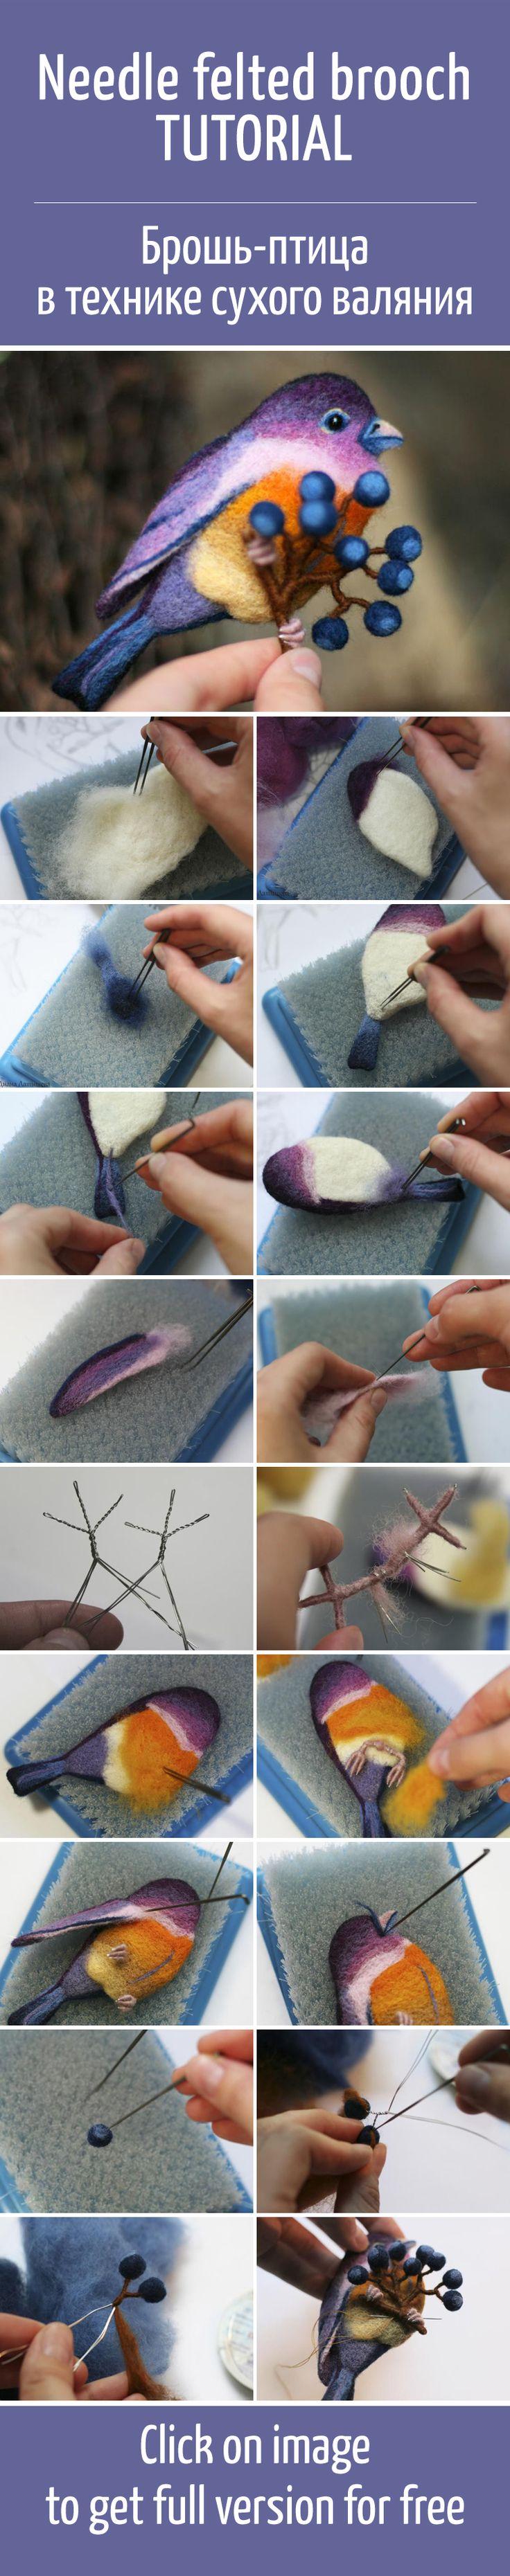 Валяем брошь «Птица – сентябринка» / Needle felted brooch birdie tutorial DIY